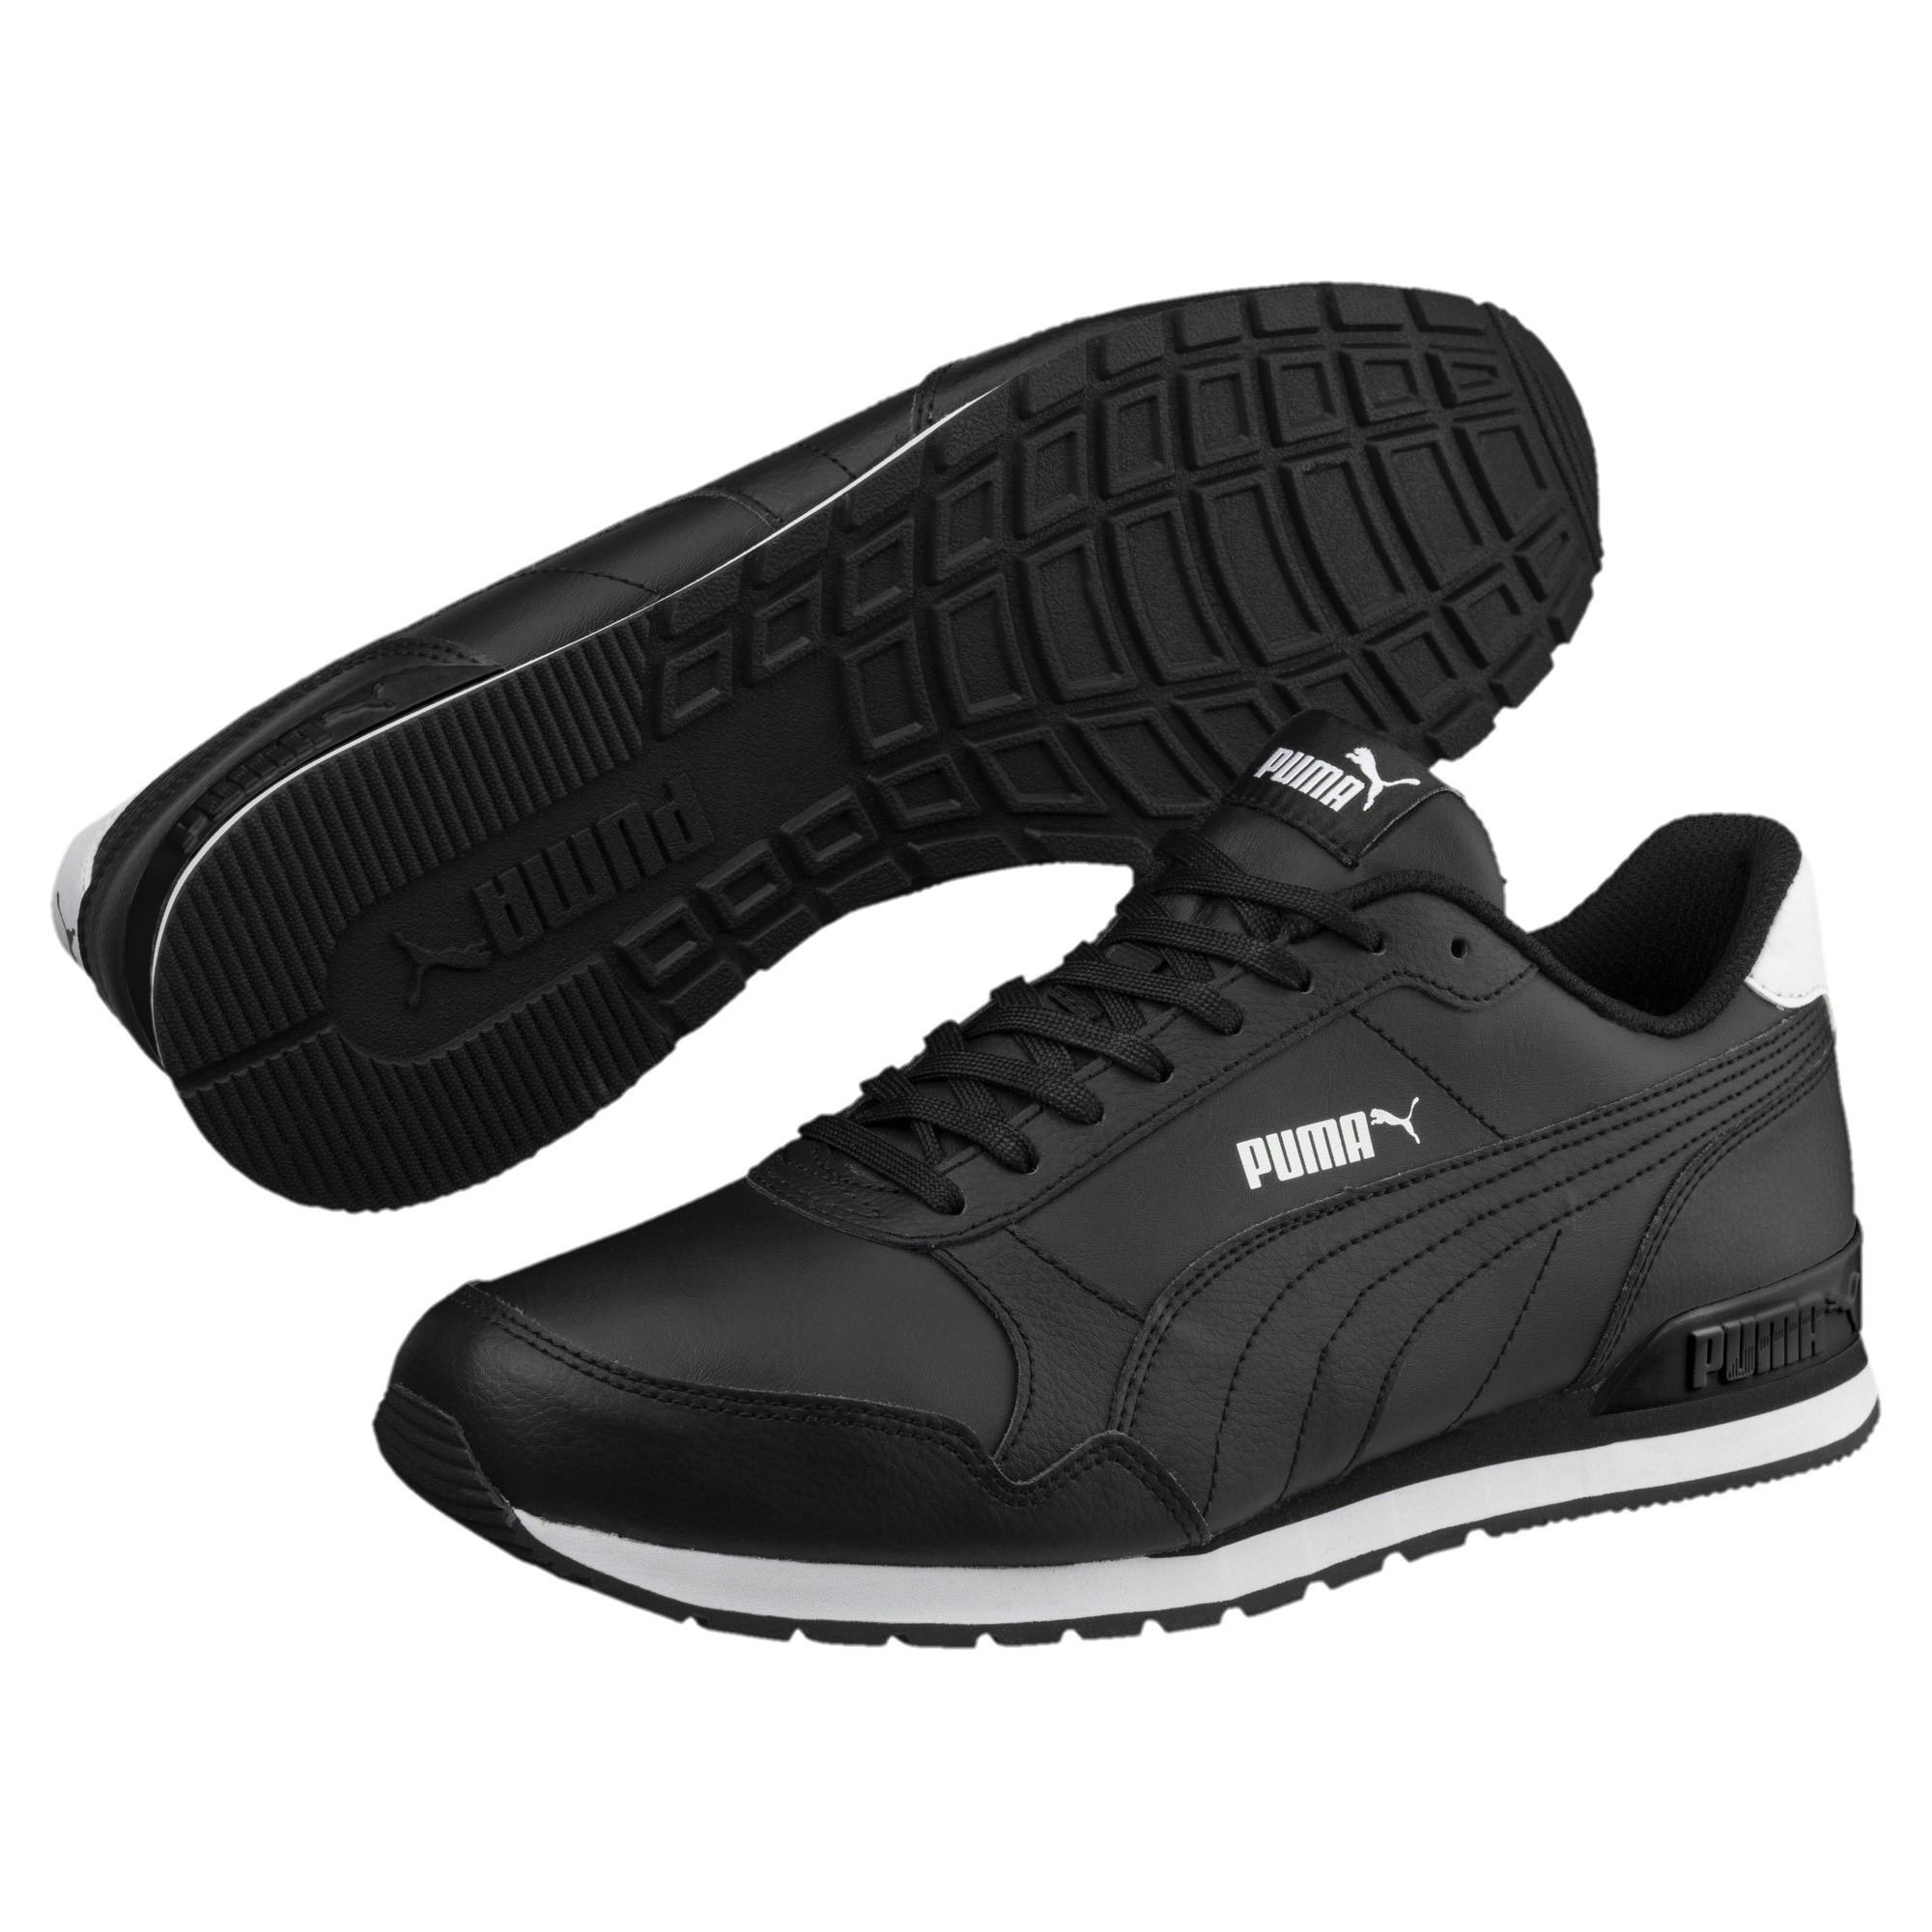 Puma St Runner V2 Full L, PUMA-BLACK-PUMA-BLACK 365277